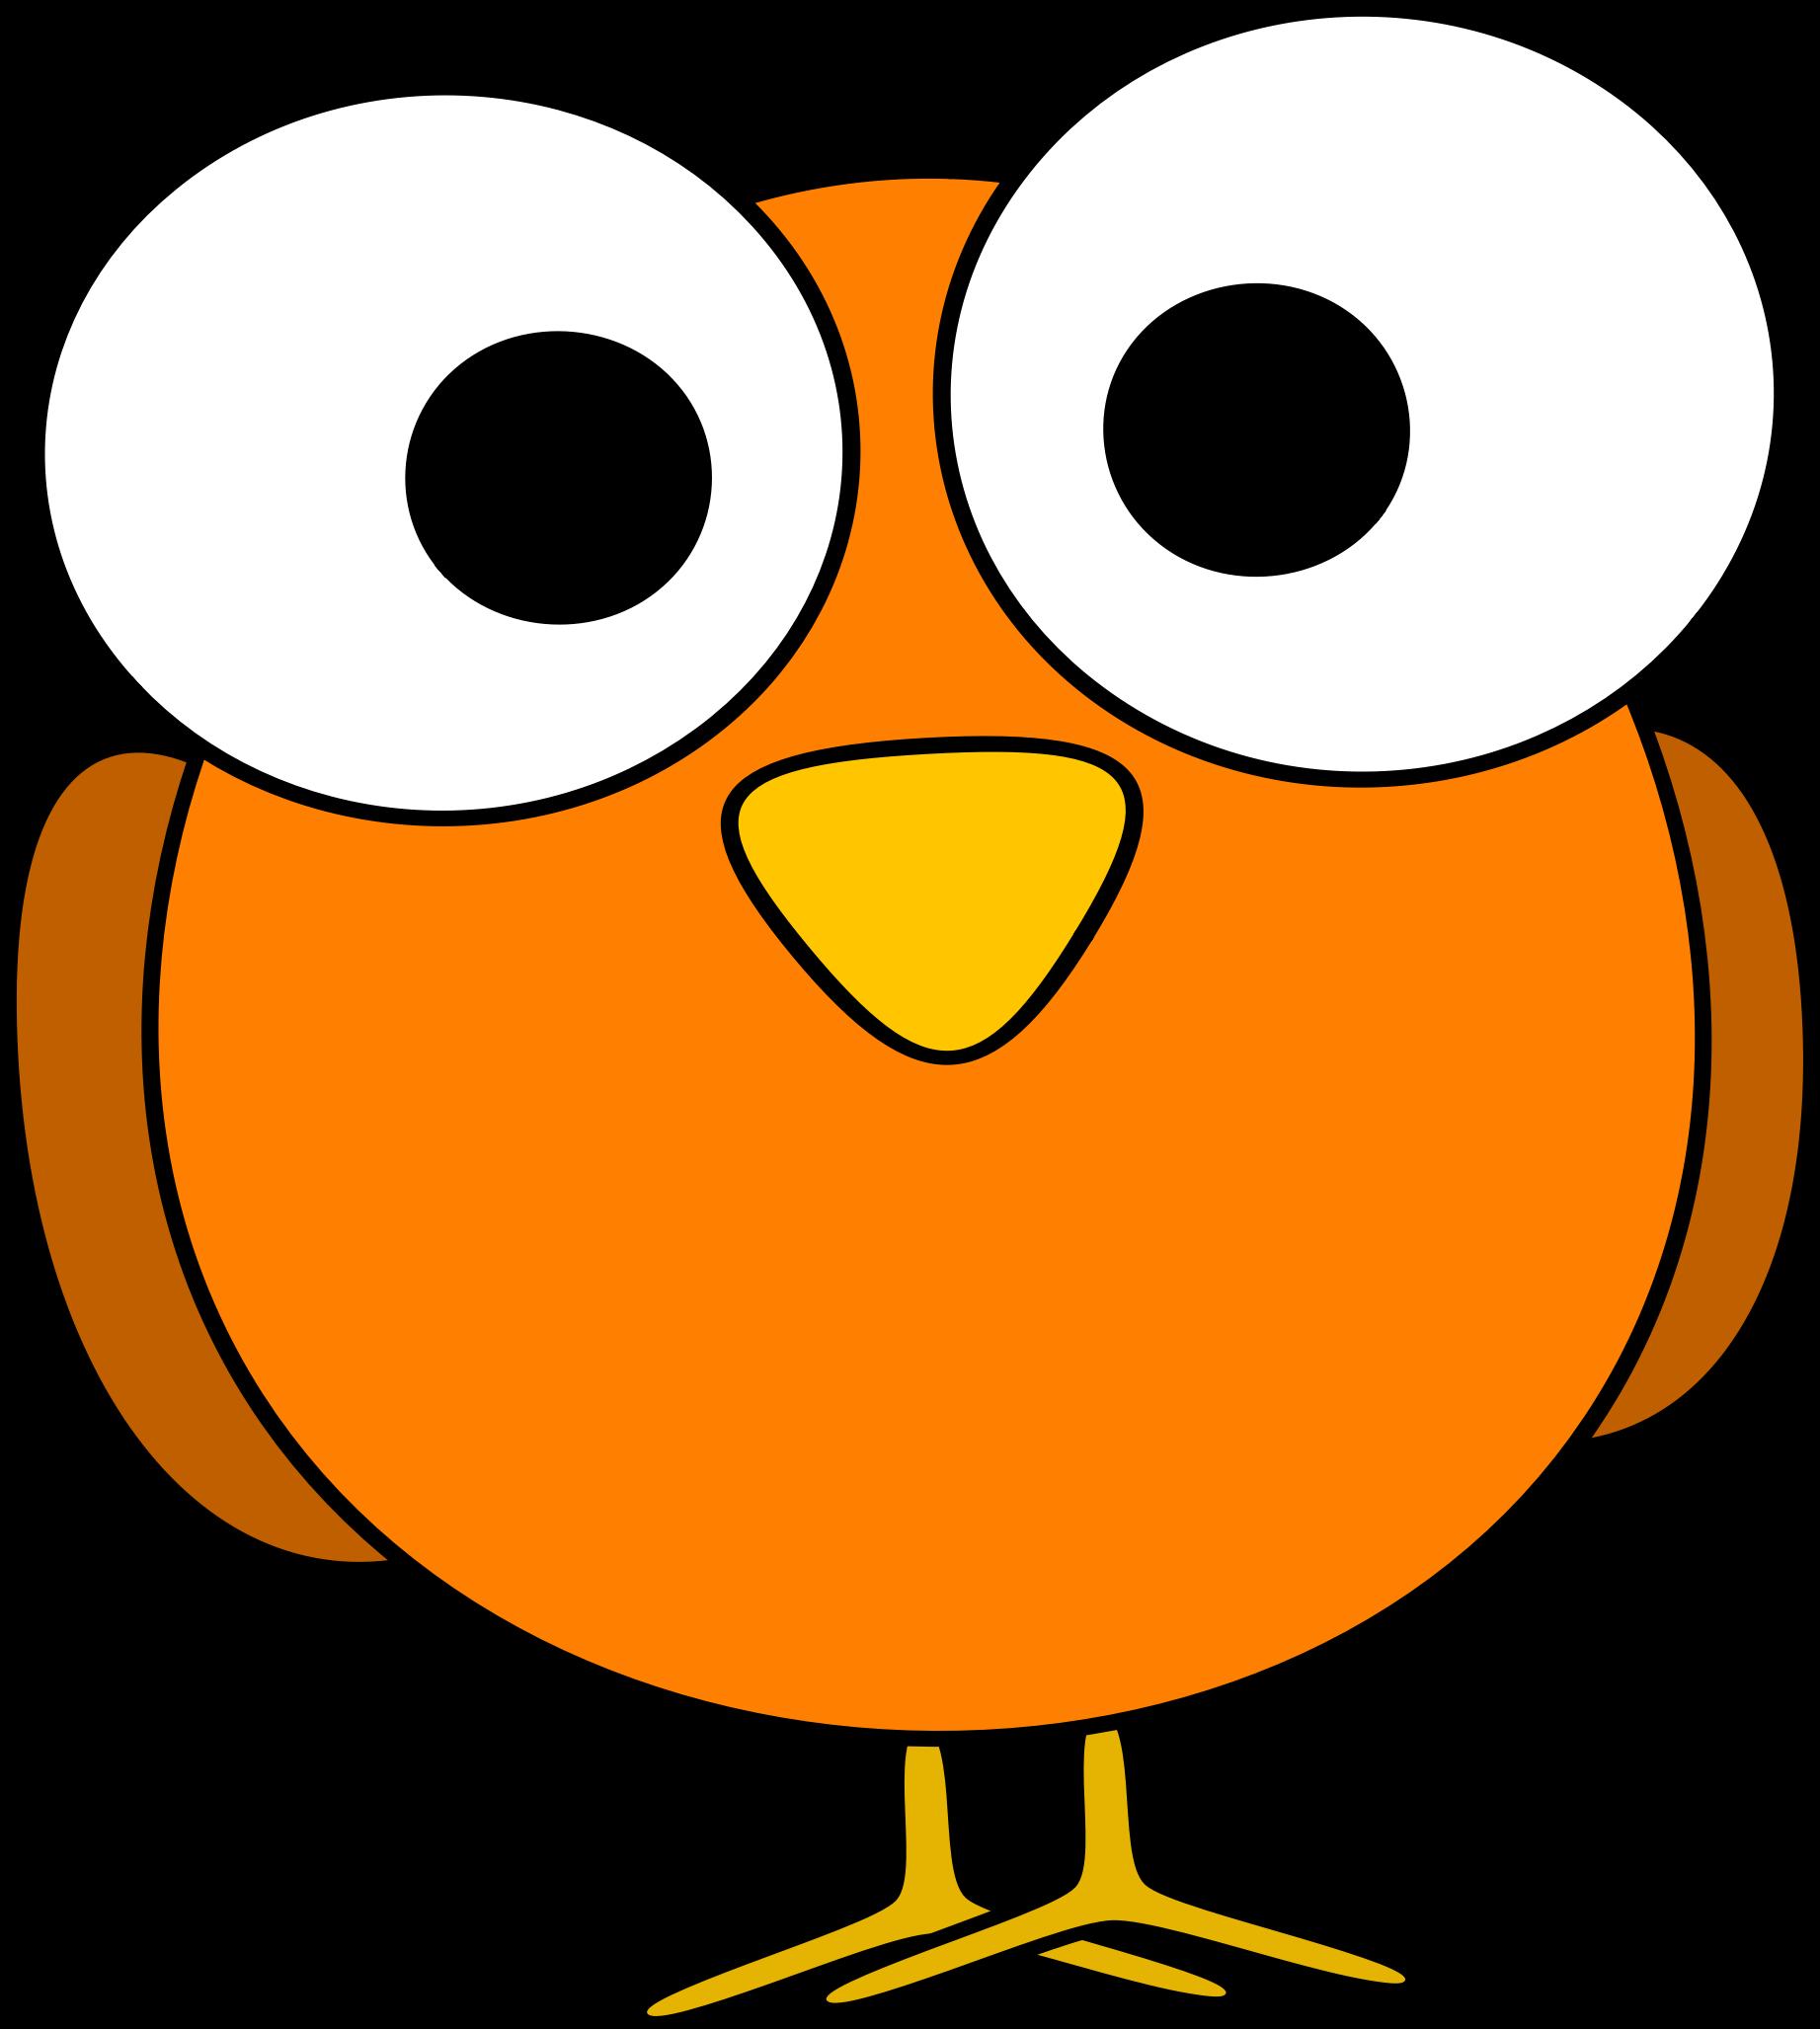 Orange Eyes clipart #6, Download drawings